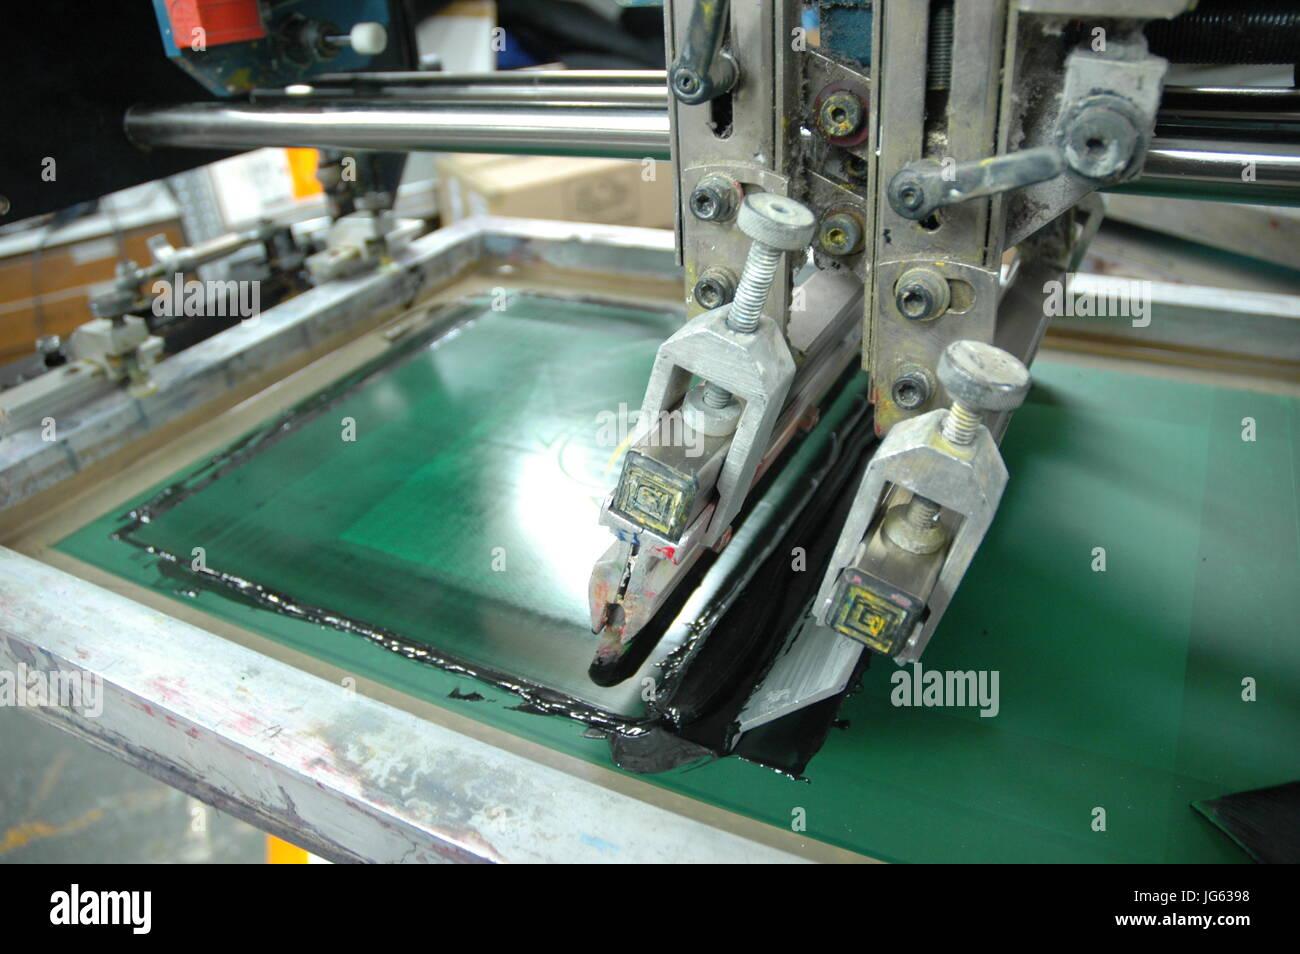 Automatic industrial screen printing machine branding t